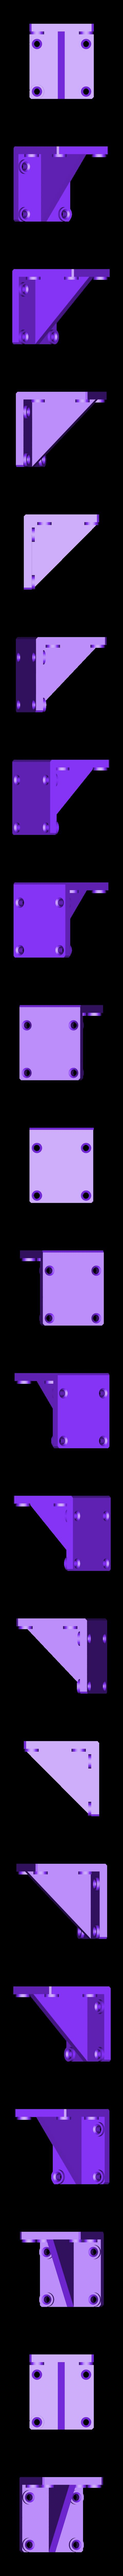 P&B_4.stl Download free STL file P & B ARMY (PIPE AND BOARD) • 3D printable model, DJER